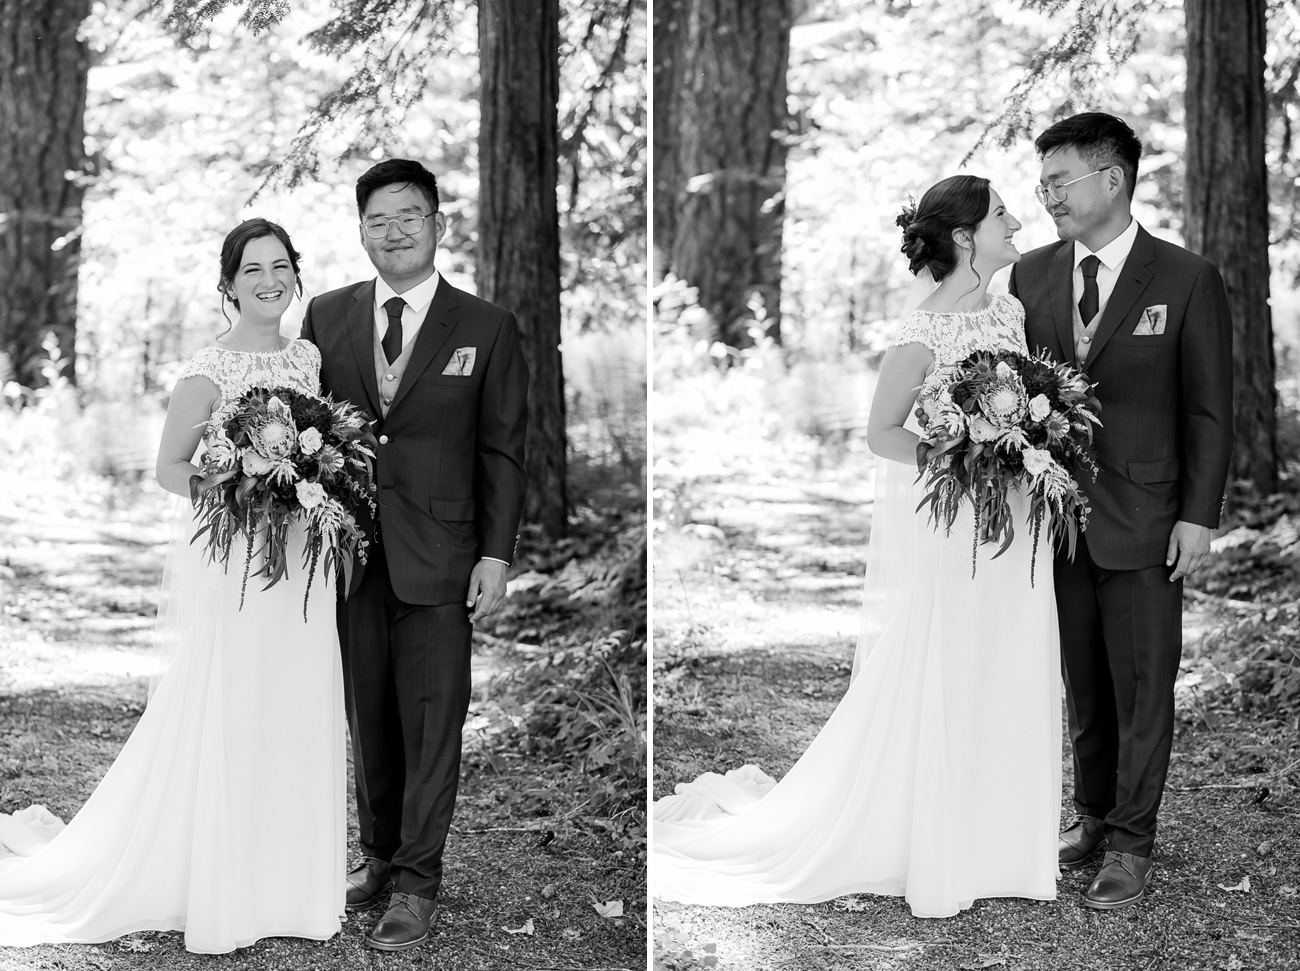 loloma-lodge-oregon-wedding-63 Loloma Lodge Oregon Wedding | Anna & Justin | Traditional Korean Tea Ceremony